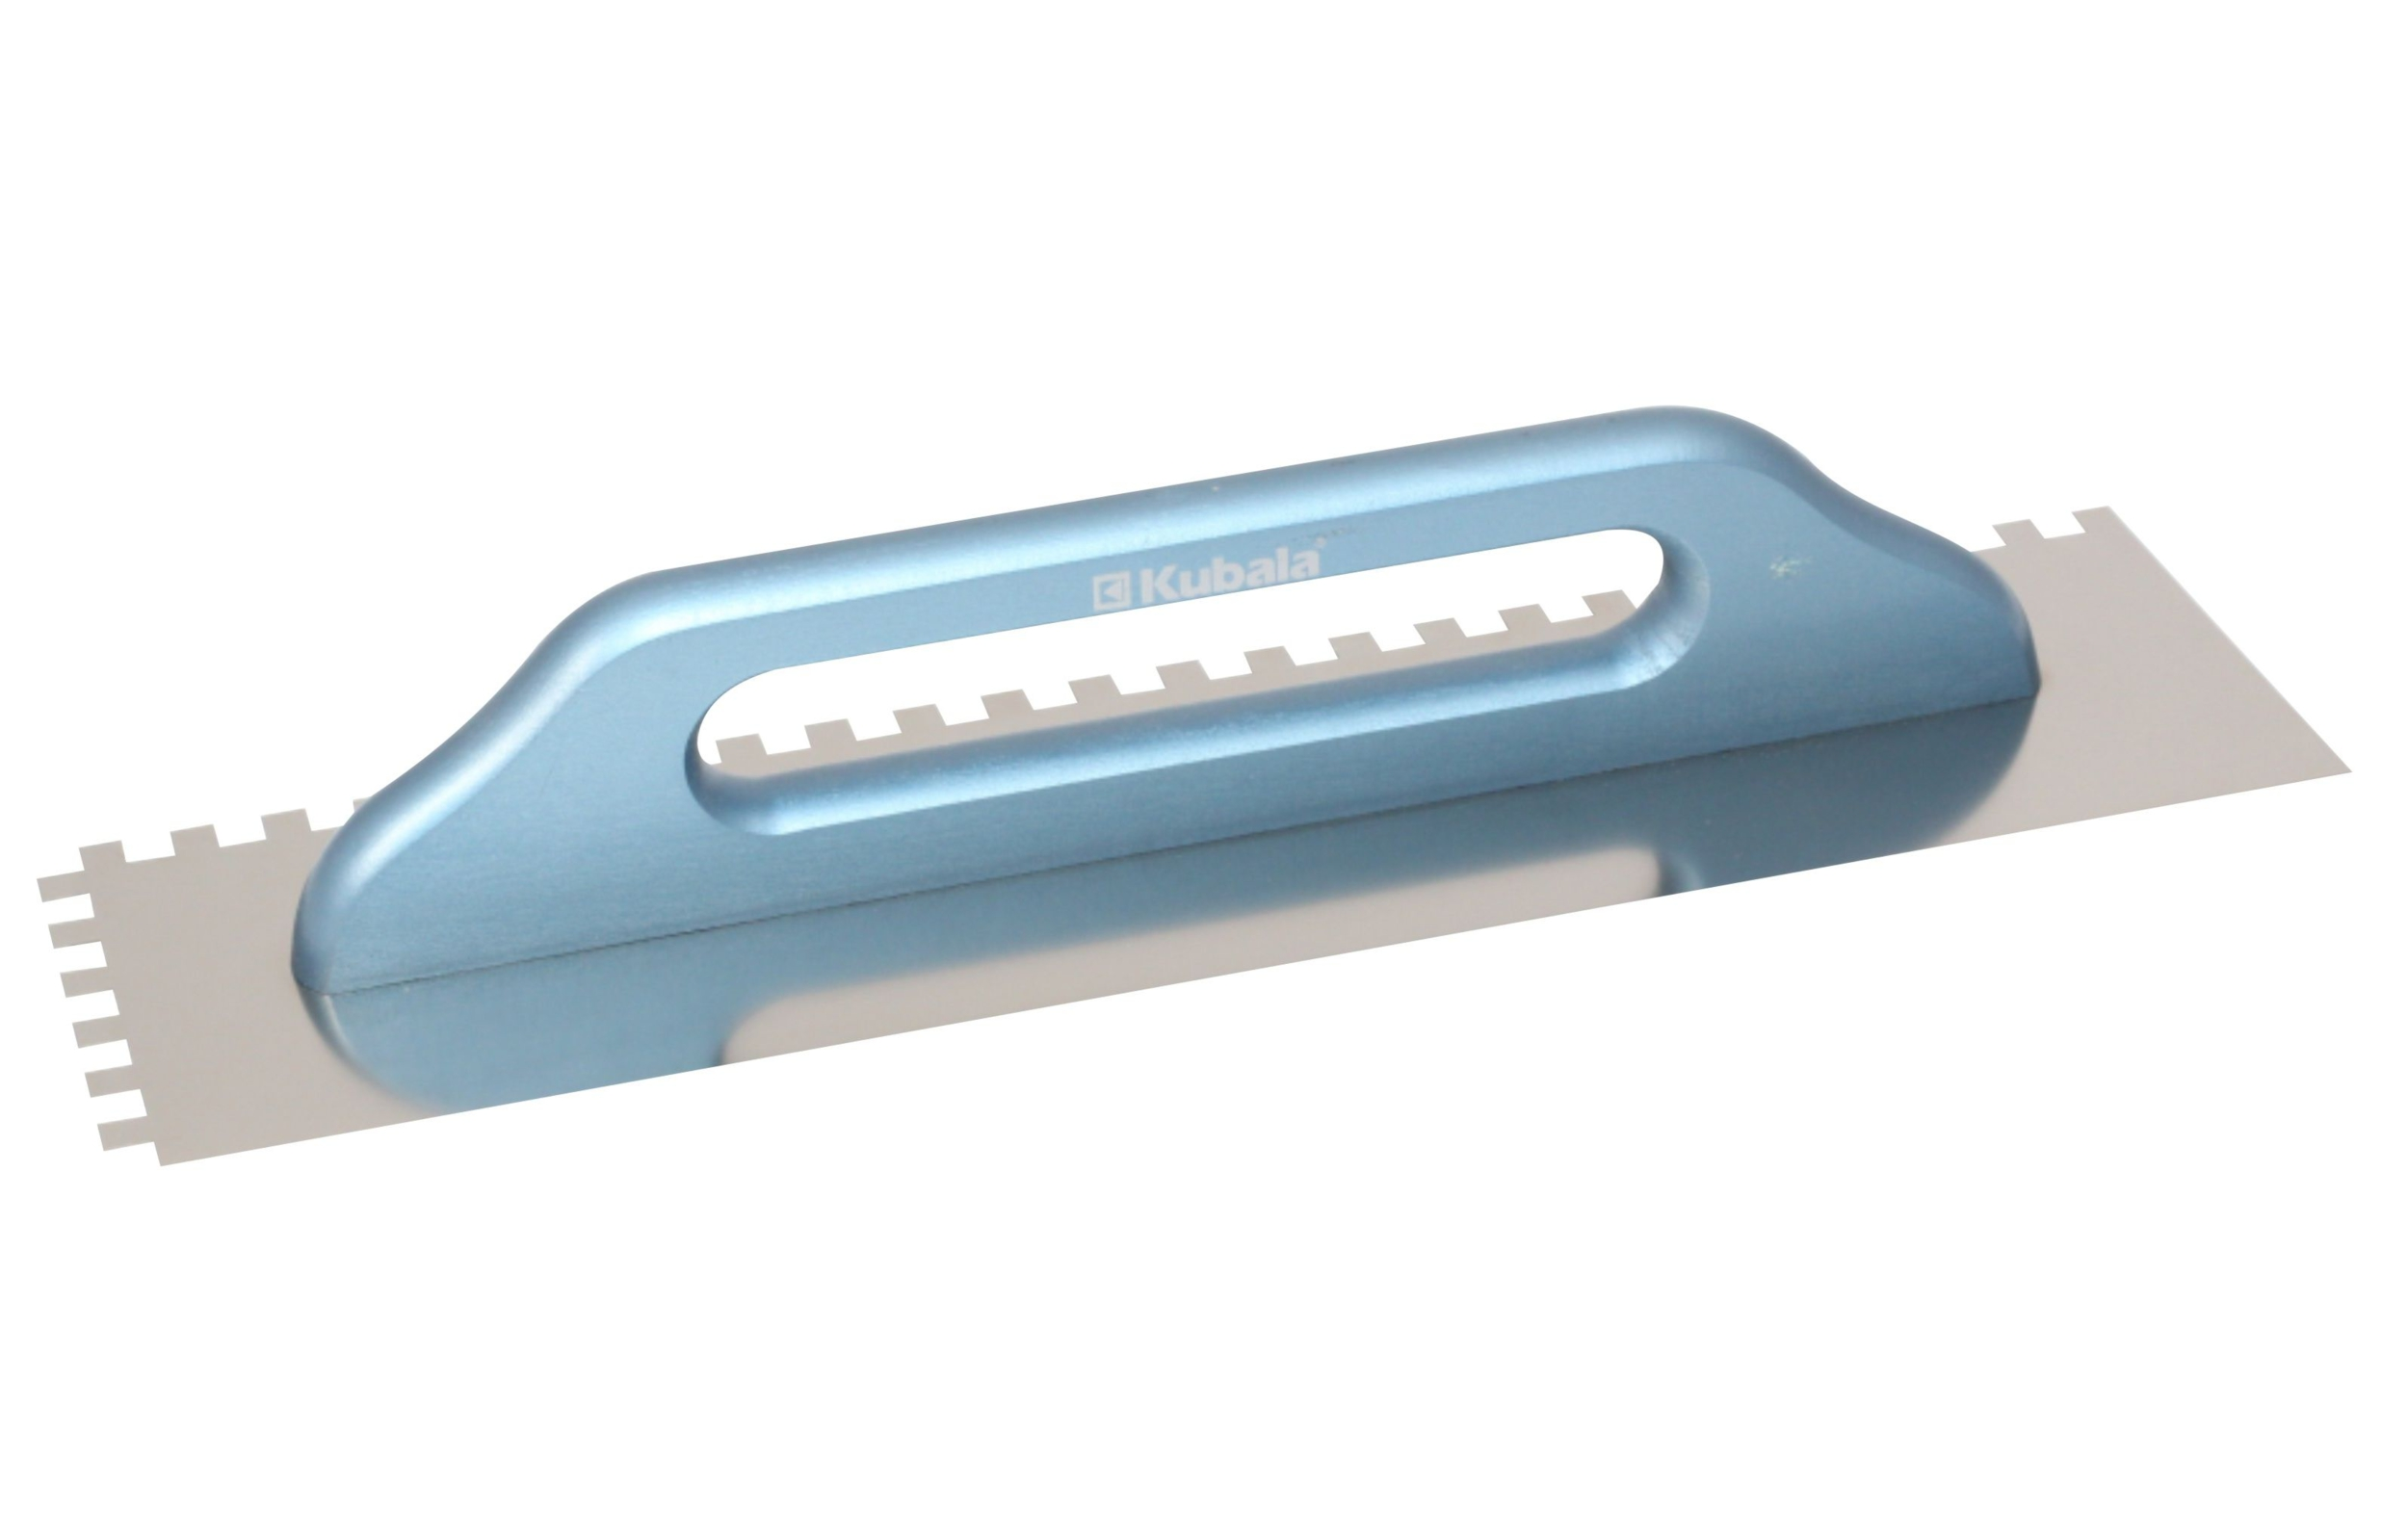 Platoir inox longue, denture carrée